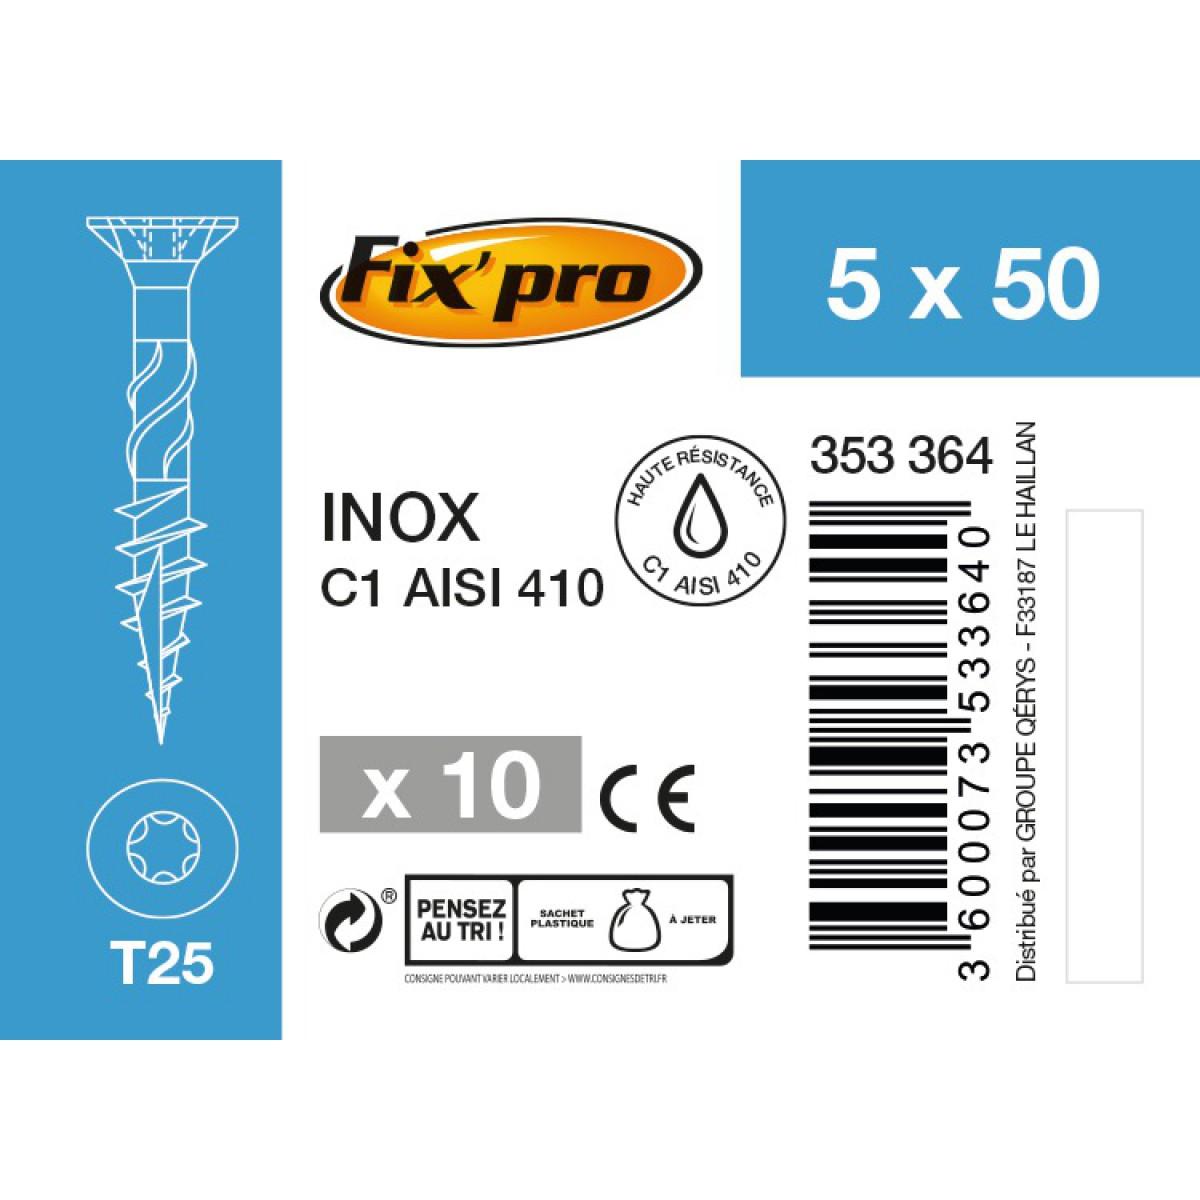 Vis terrasse inox C1 - 5x50 - 10pces - Fixpro